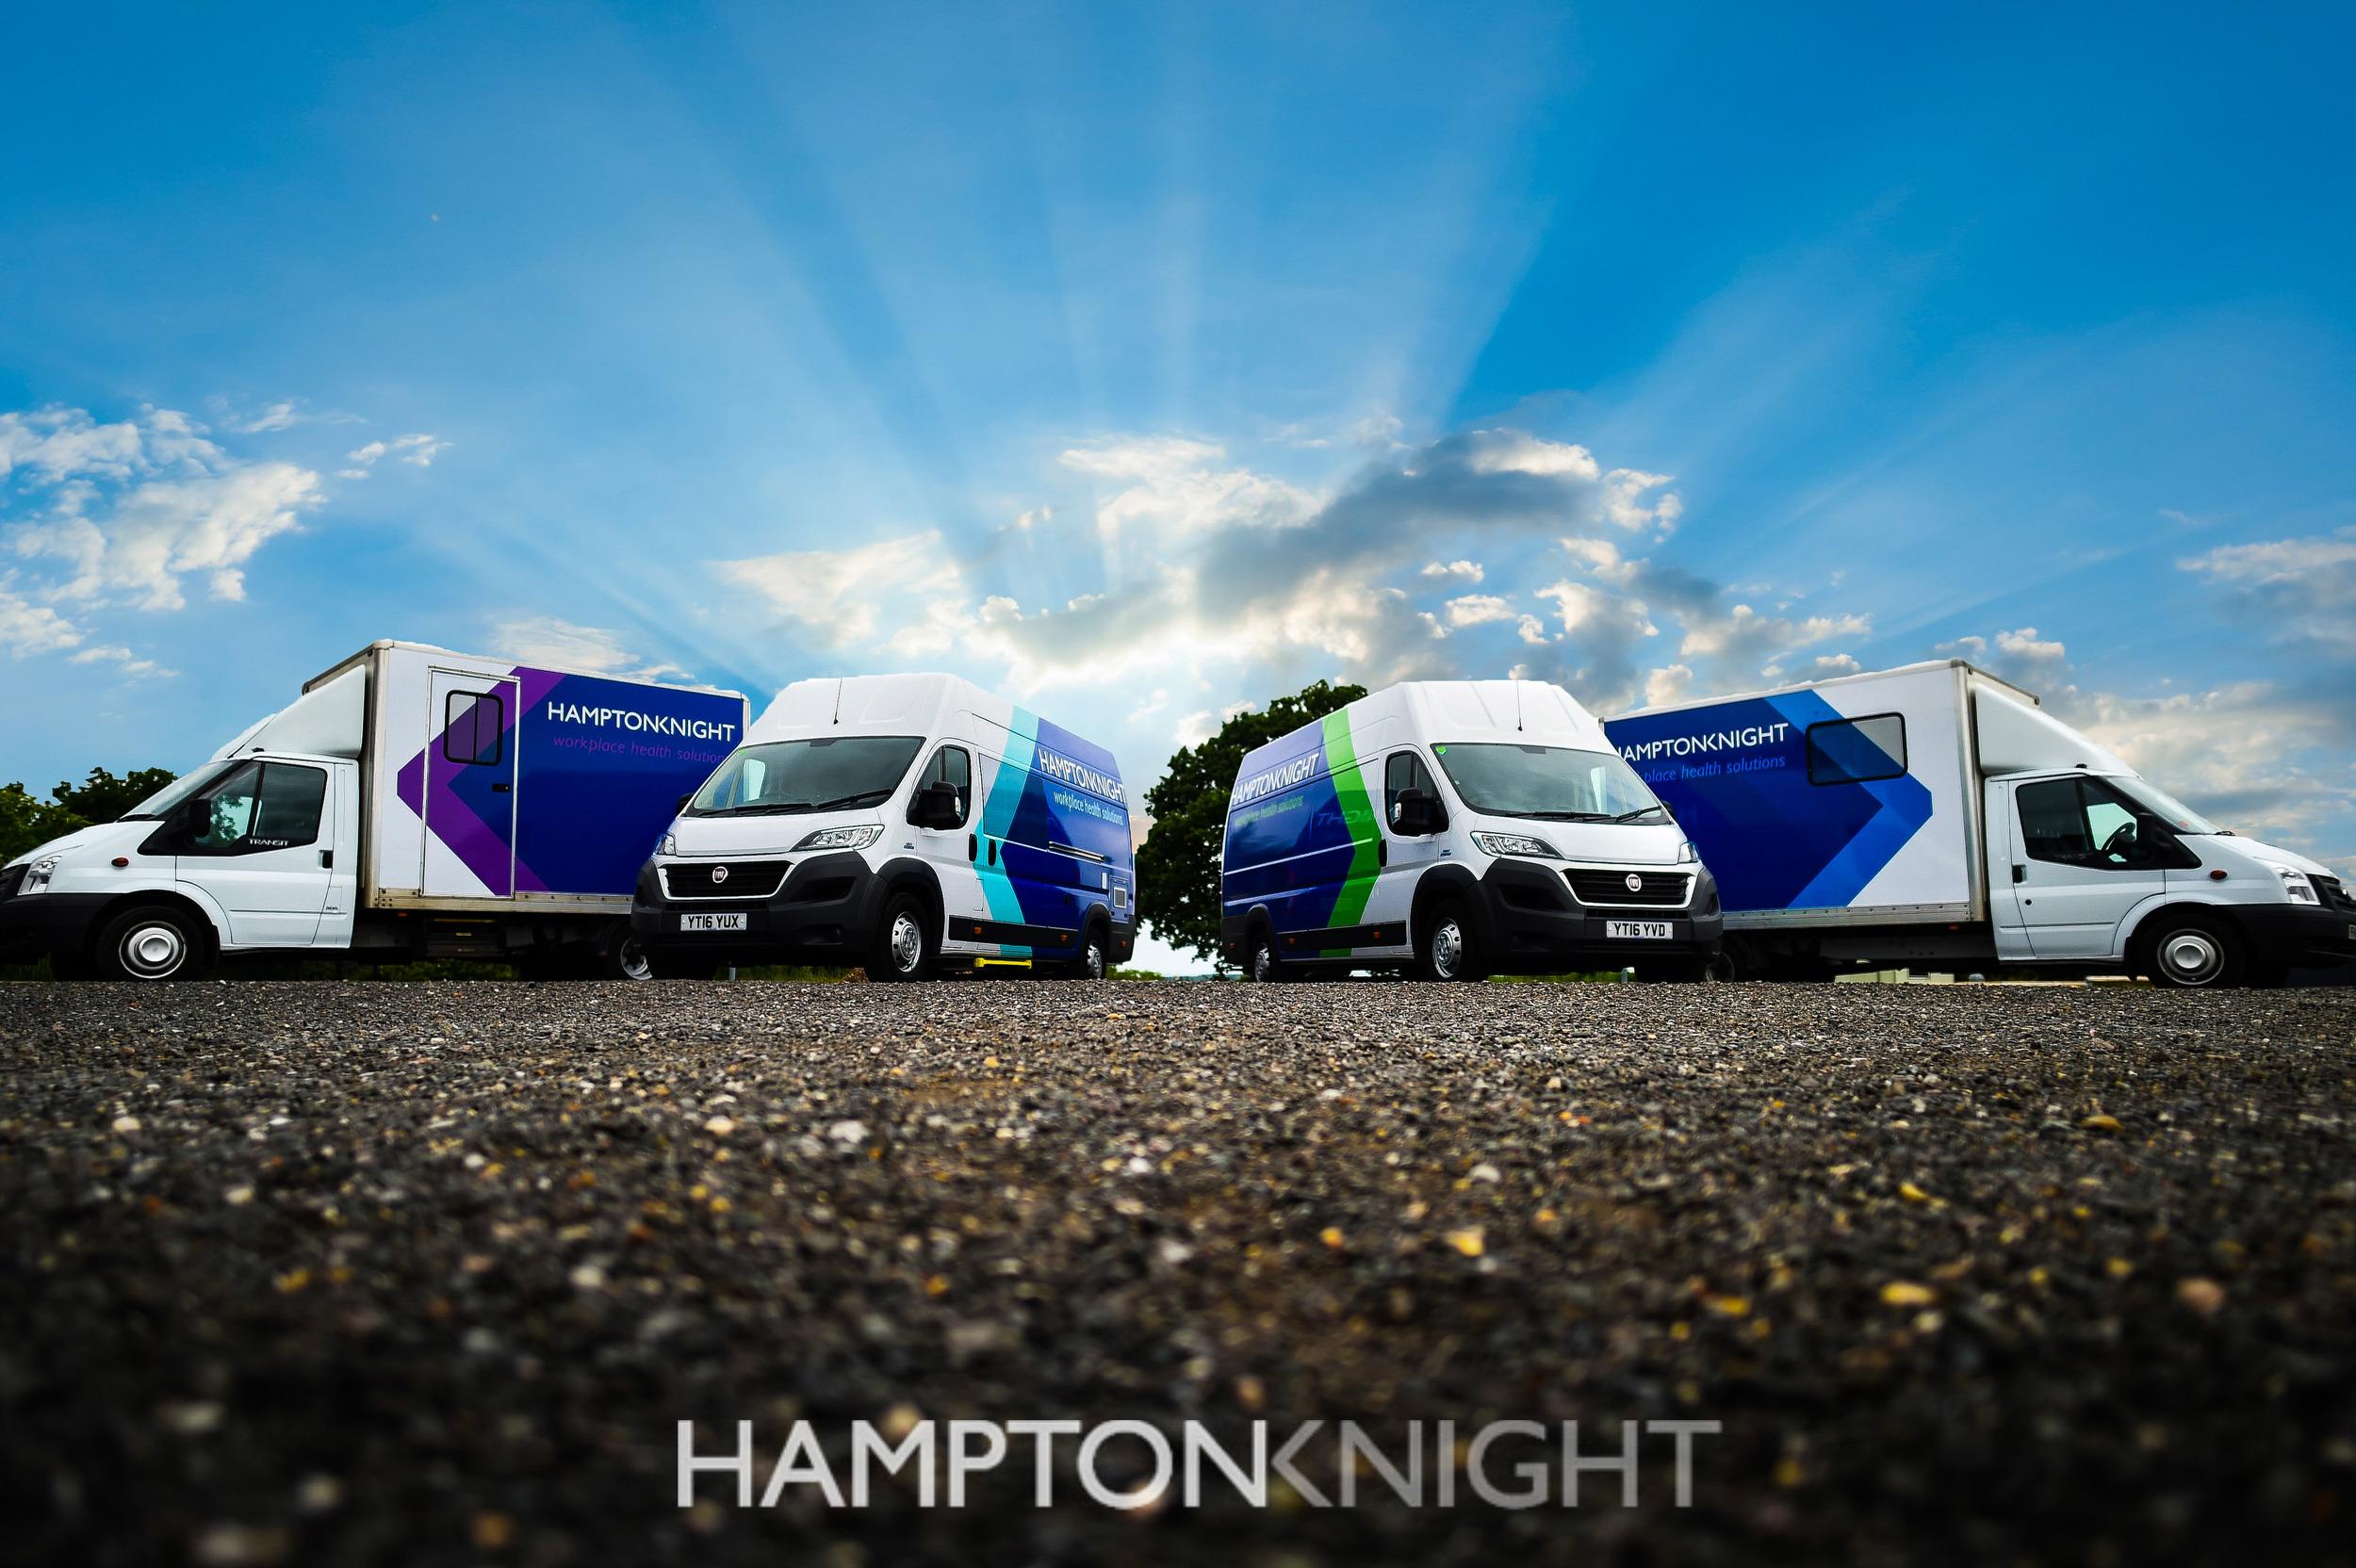 hampton knight4best-1.jpg